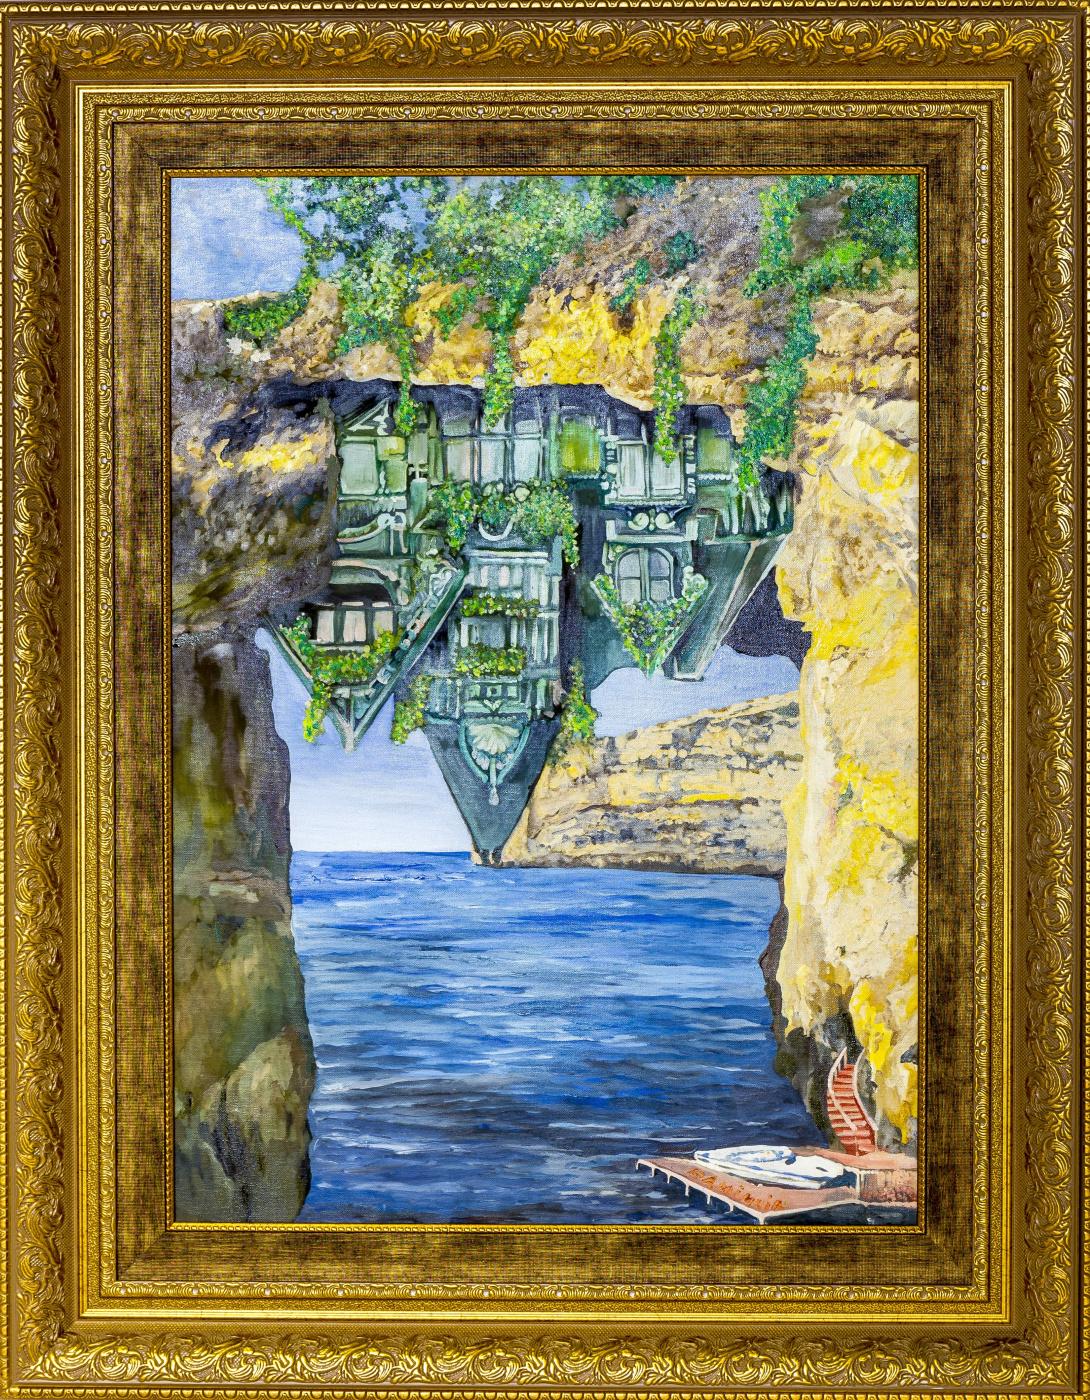 Rami Meir. Over the cliff